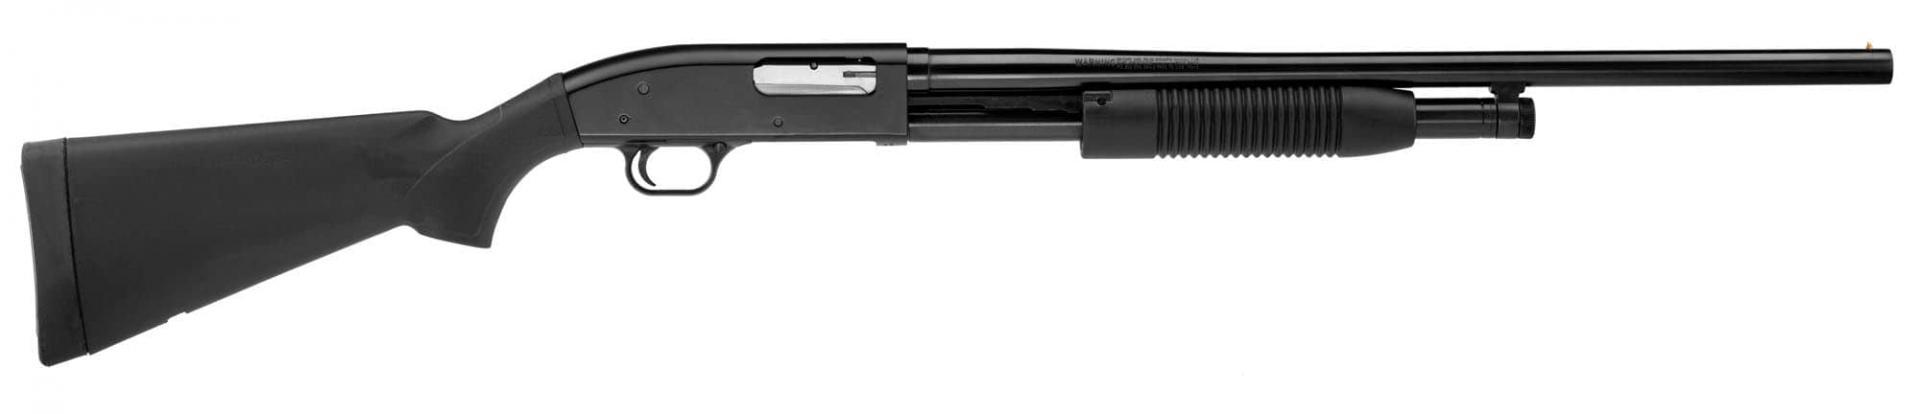 Mv700